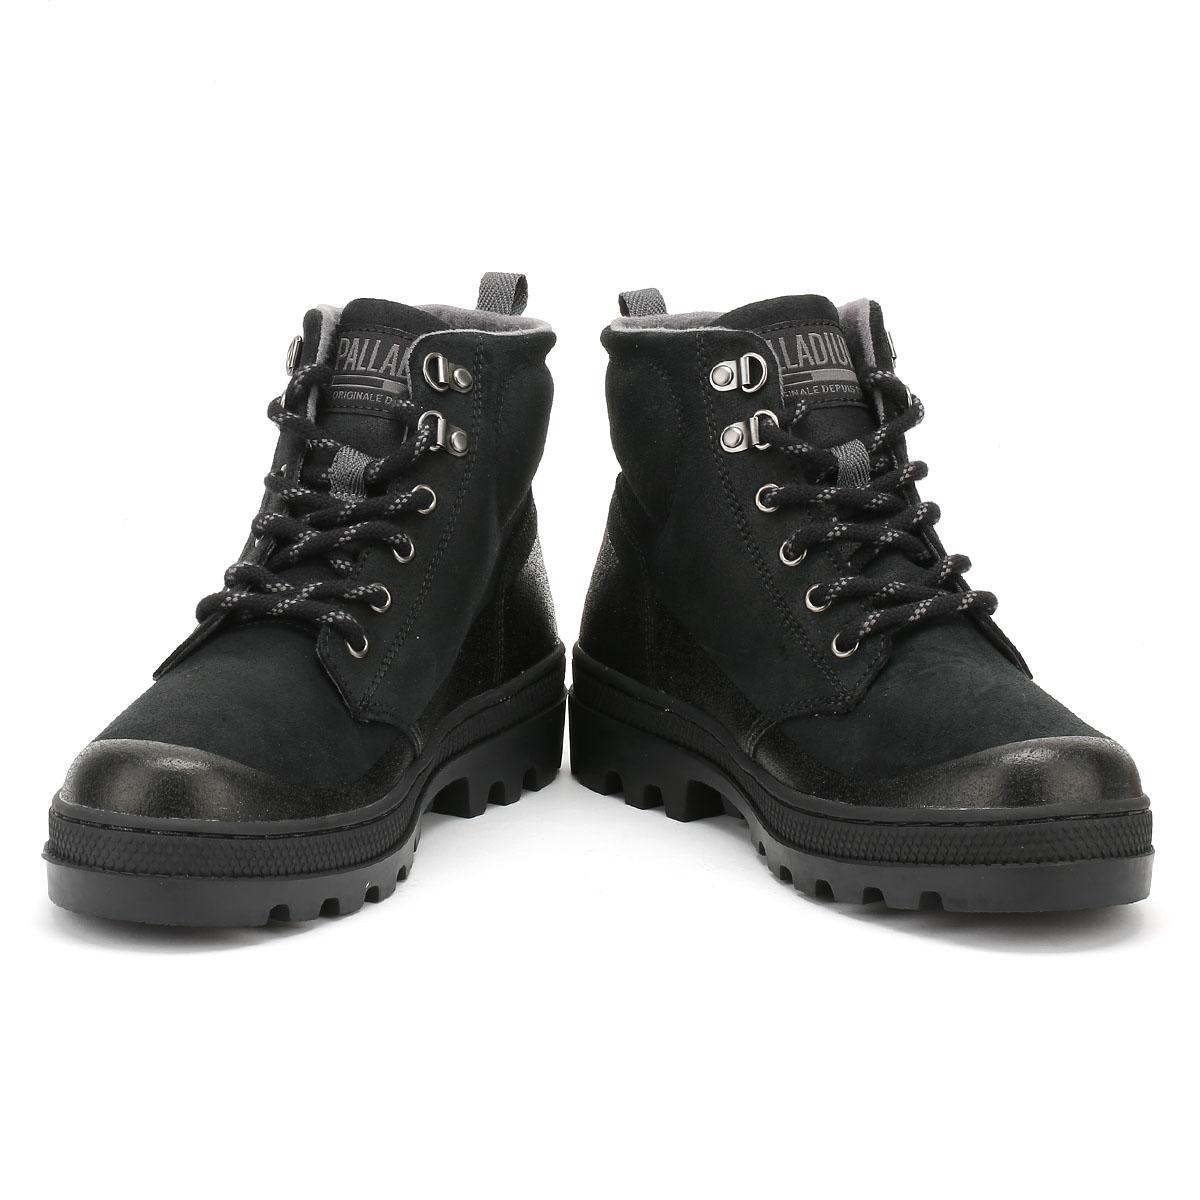 Palladium-para-hombre-Negro-O-Marron-pallabosse-Hikr-Botas-Zapatos-De-Gamuza-Tobillo-De-Invierno